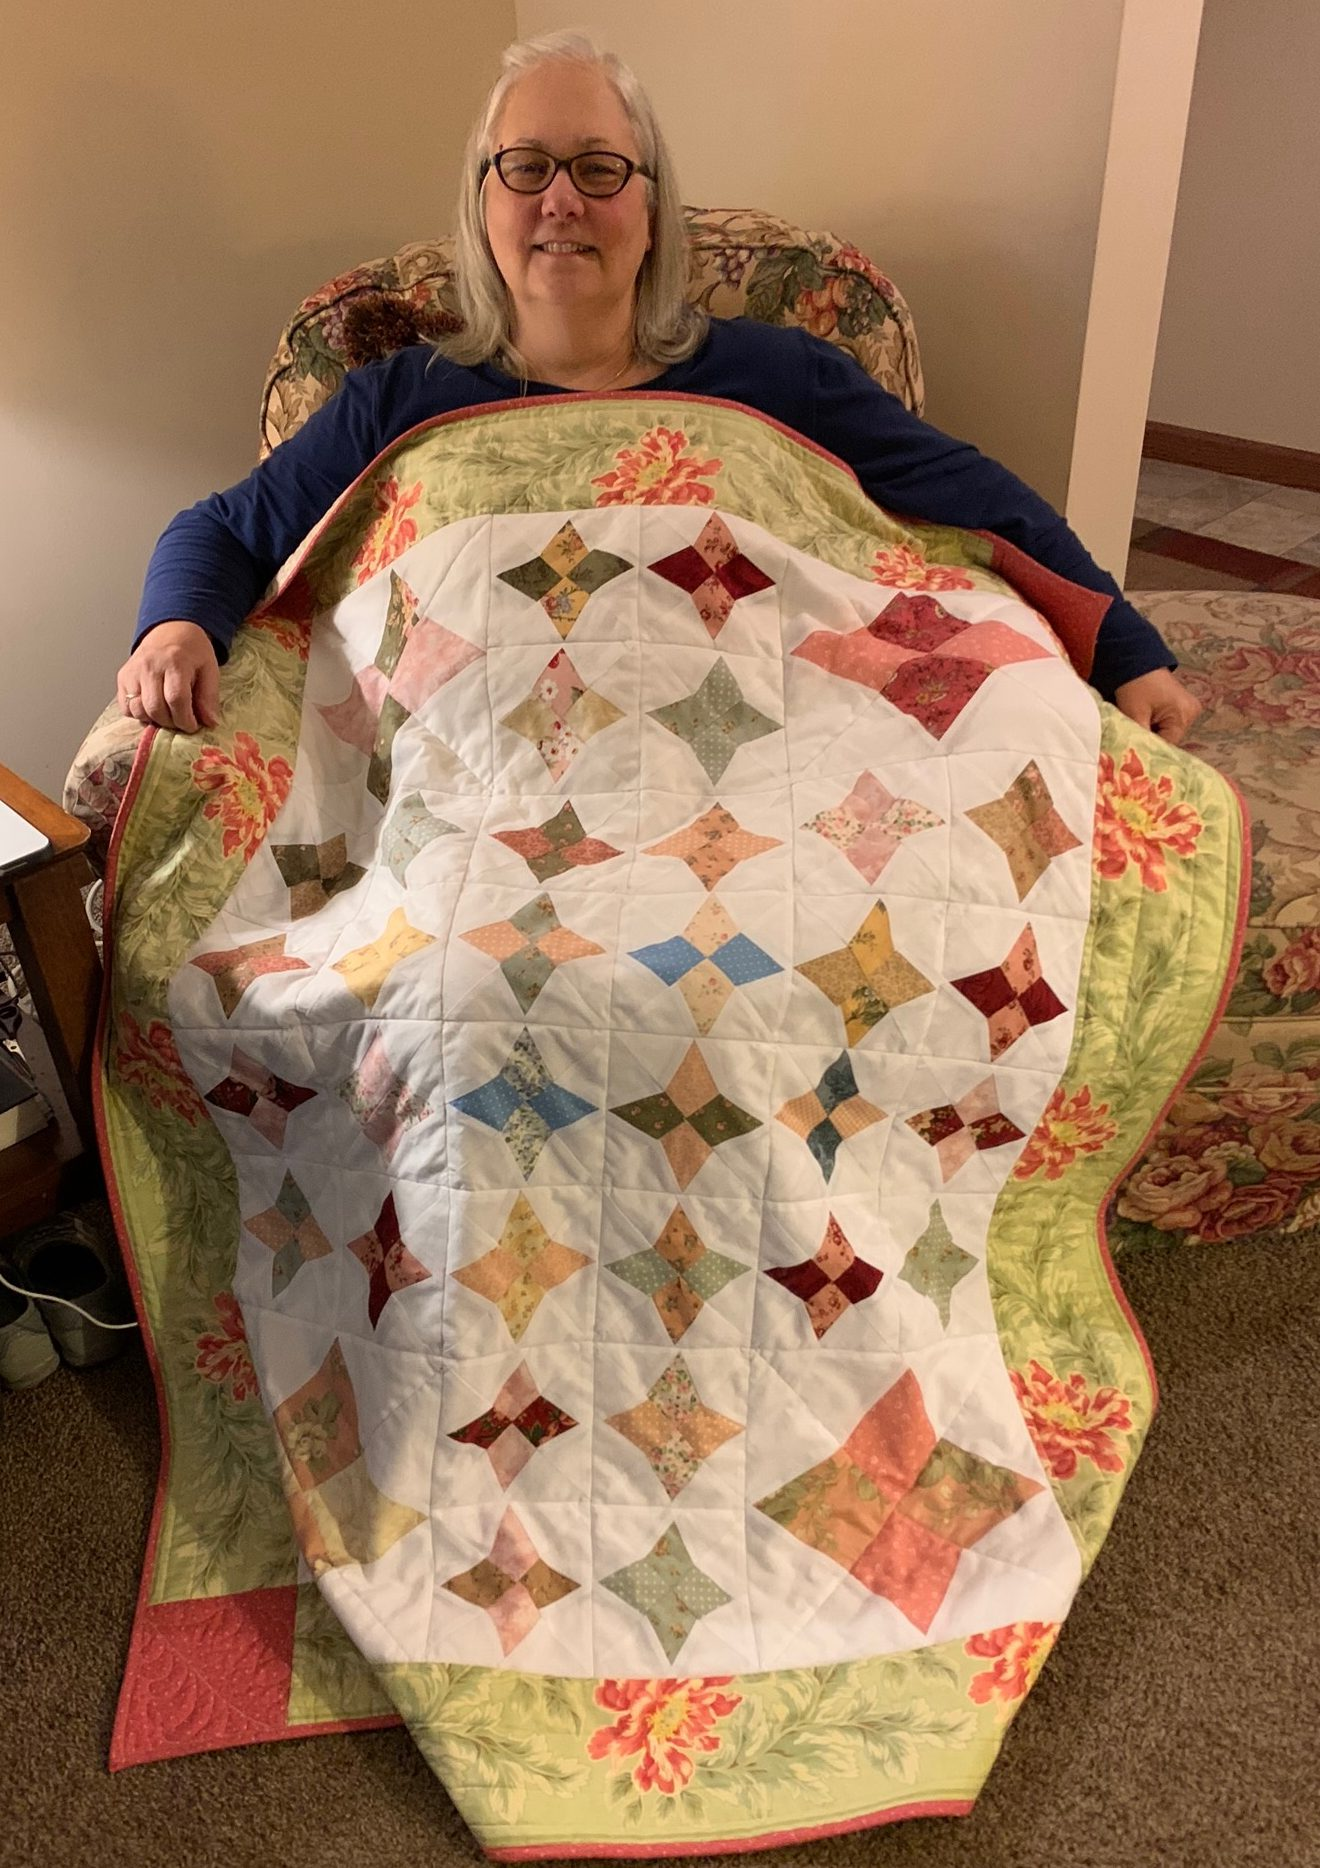 Quilt made with AccuQuilt Kite Die